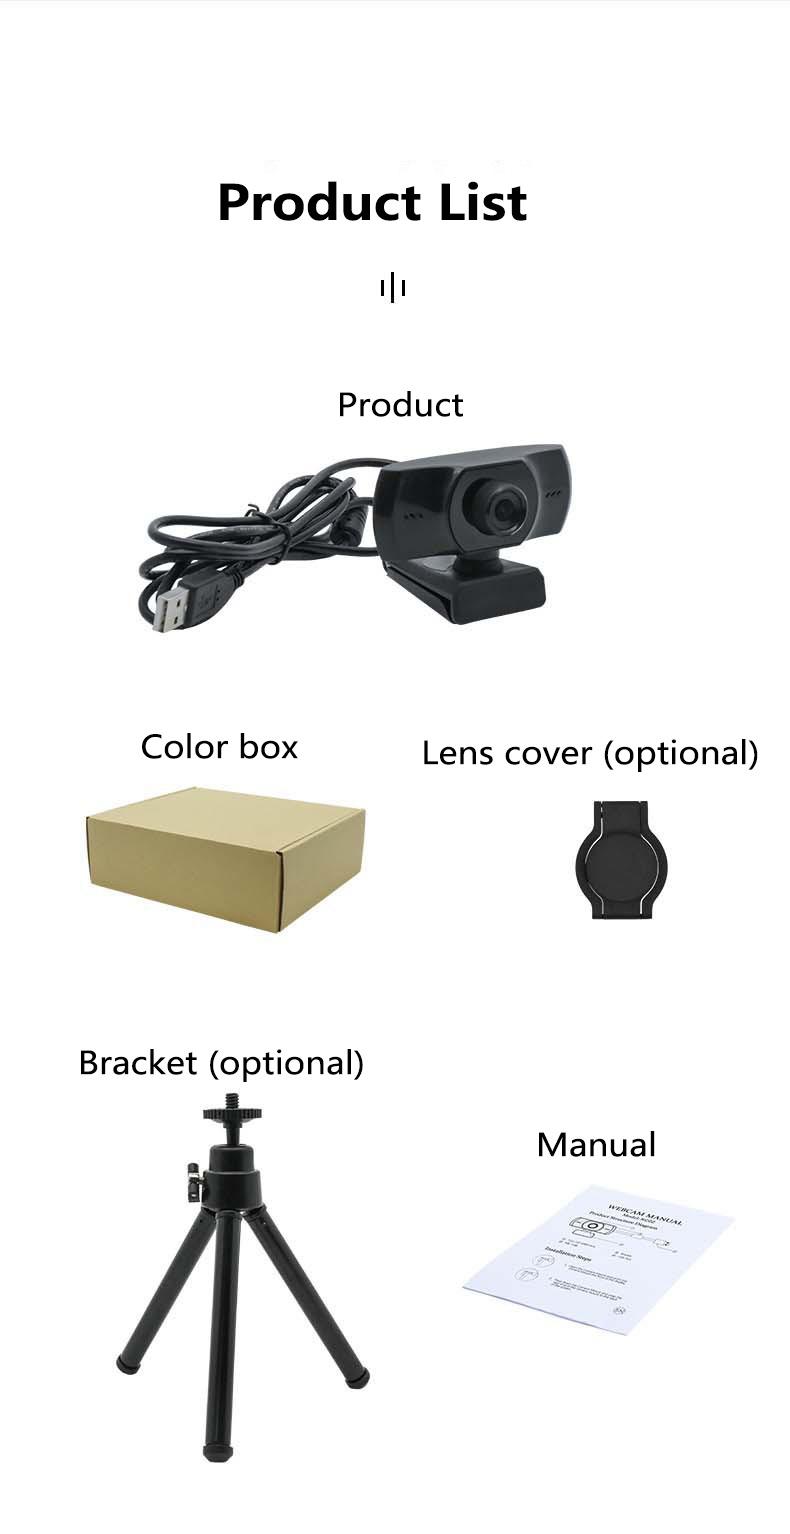 KC02 Autofocus Webcam With Tripod 1080P Web Camera With Microphone For Pc/Computer Usb Camera Web Cam Webcam Full Hd